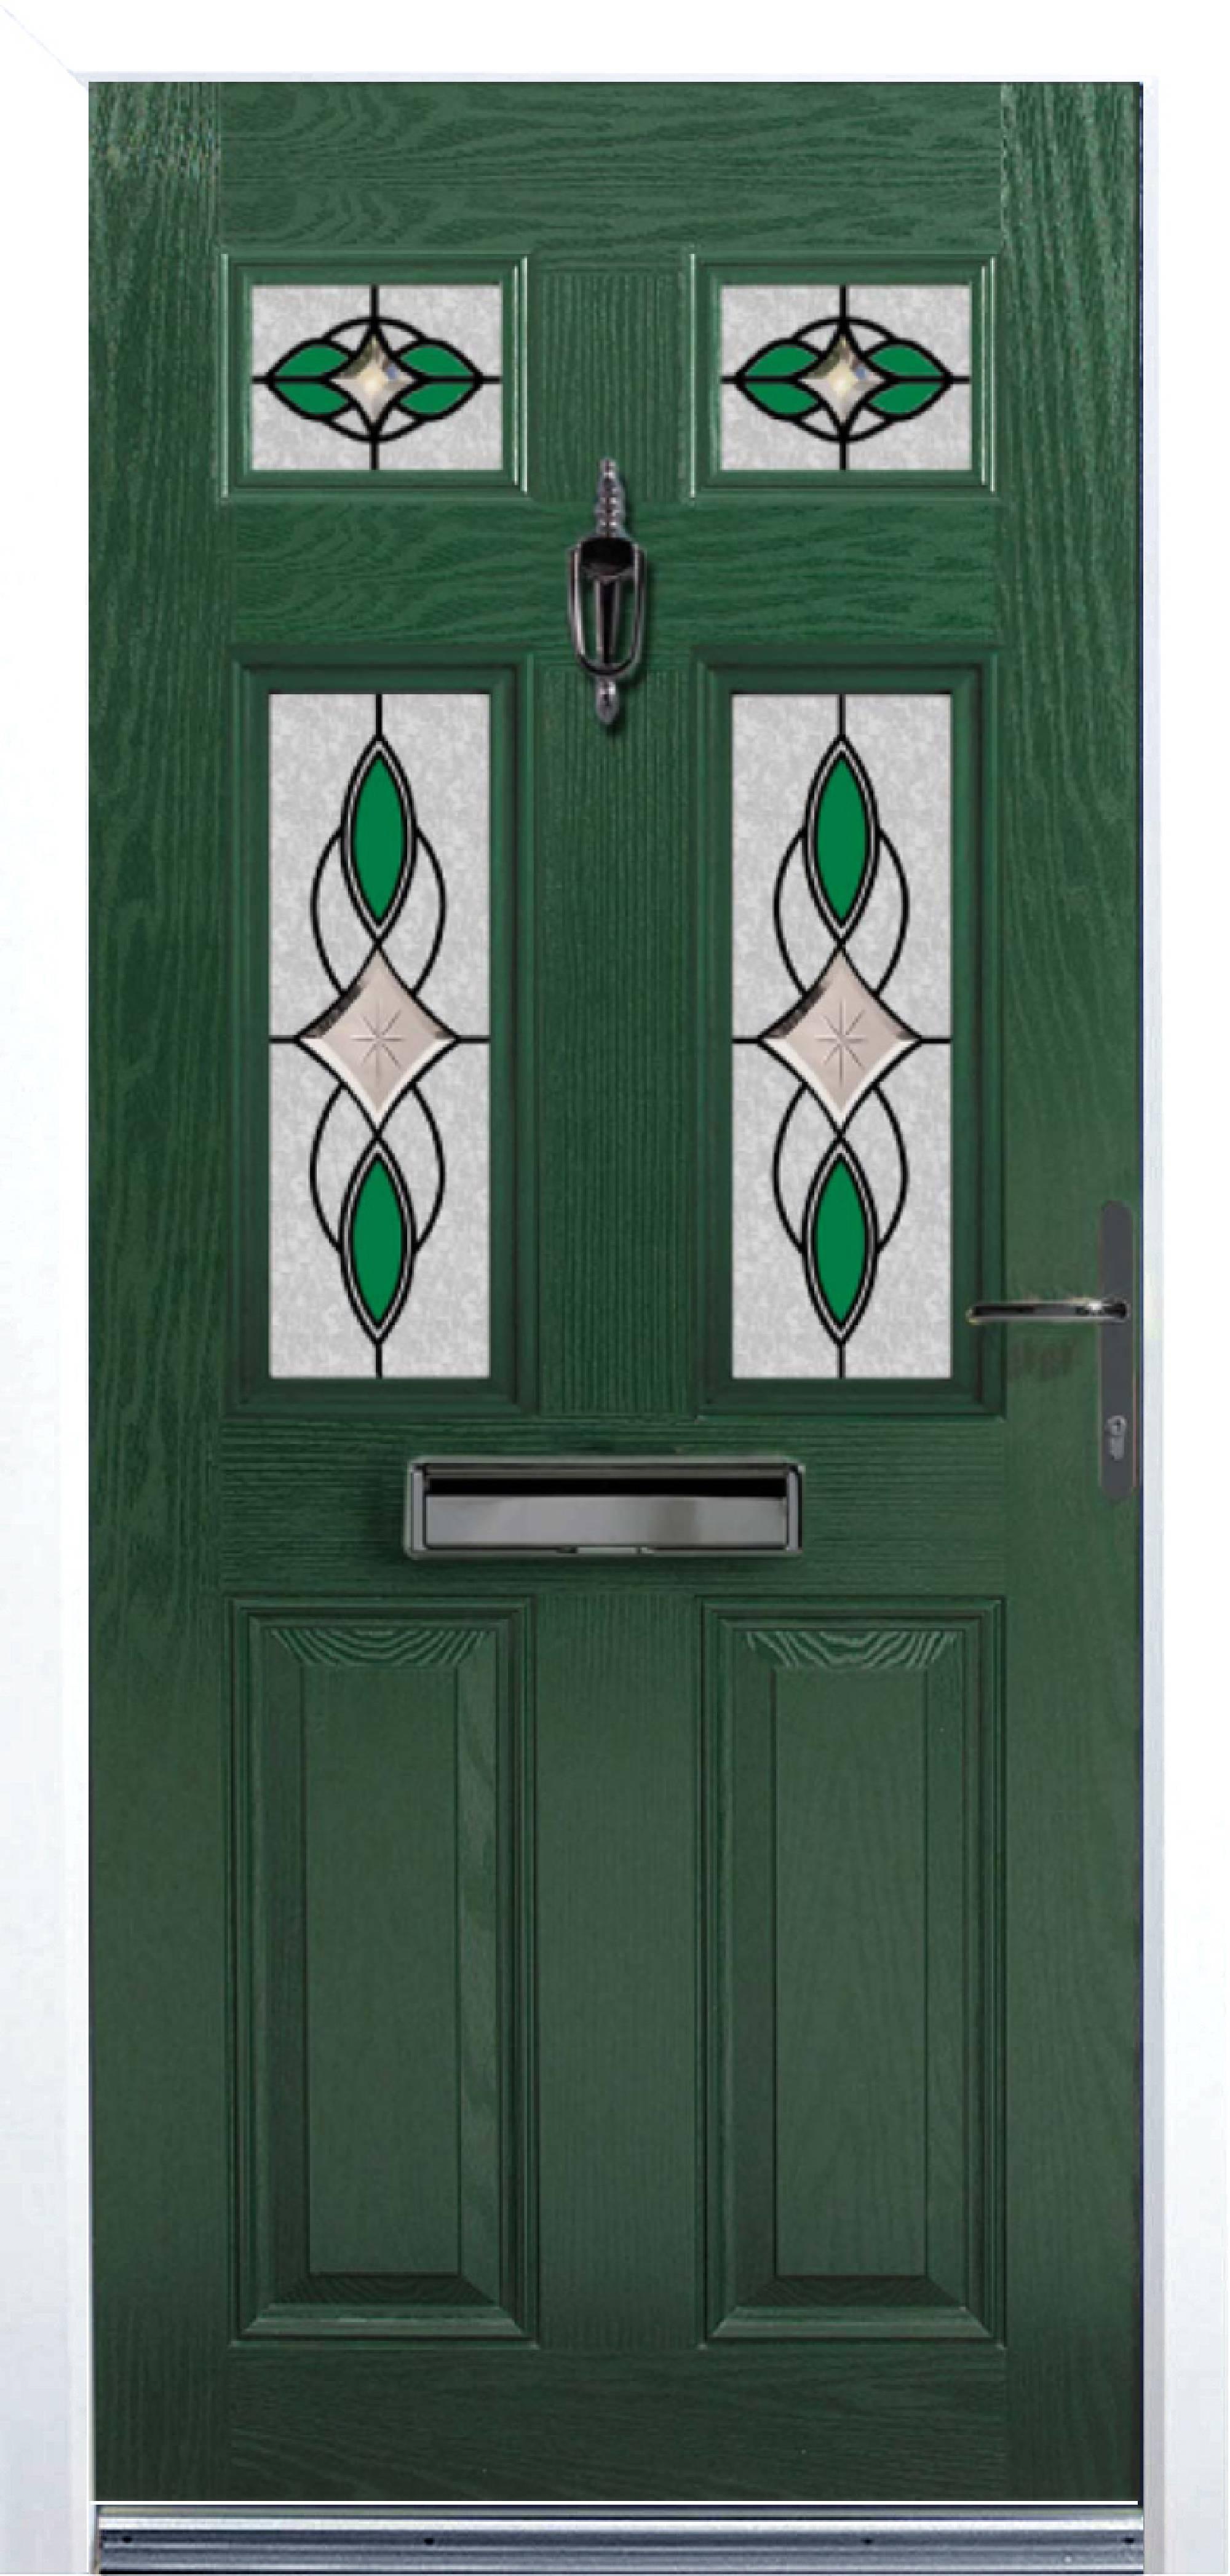 timor-green-2000x4189